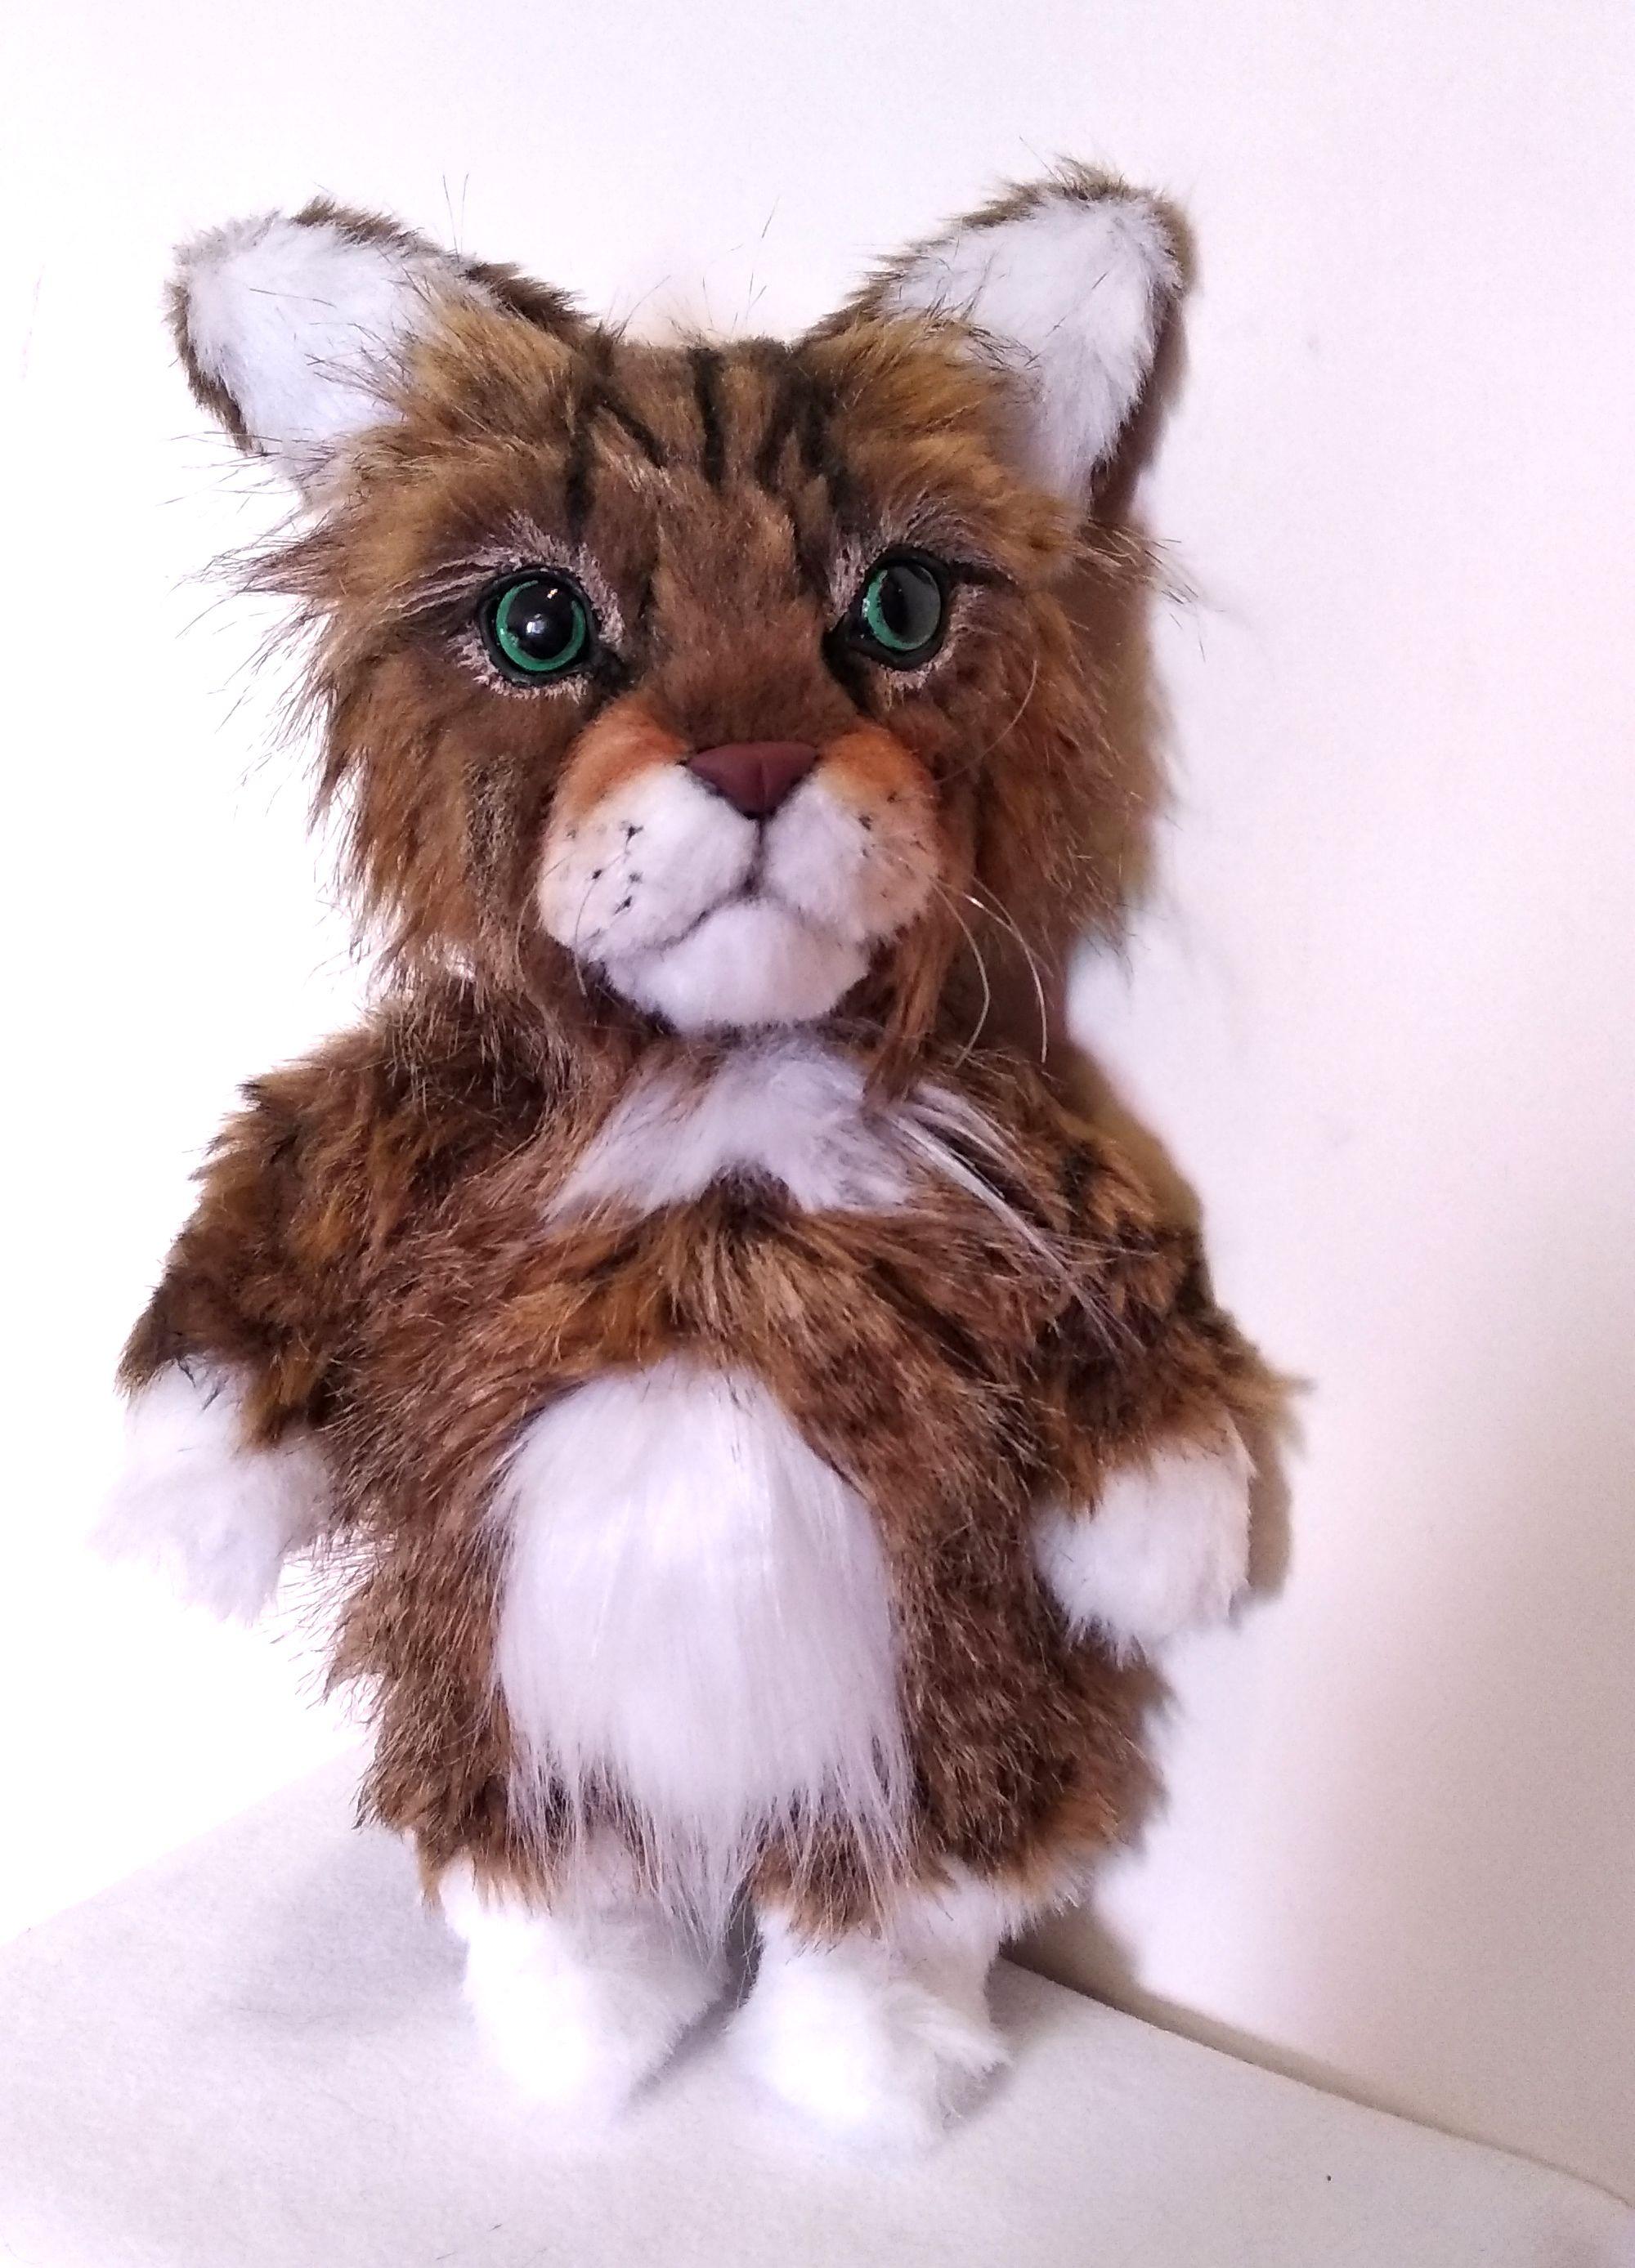 Custom Pet Portrait Toy Realistic Plush Dog Or Cat Toy Dog Cat Stuffed Dog Handmade Puppy Dolls Personalized Custom Pet Plush Dog Cat Plush Toy Cat Plush